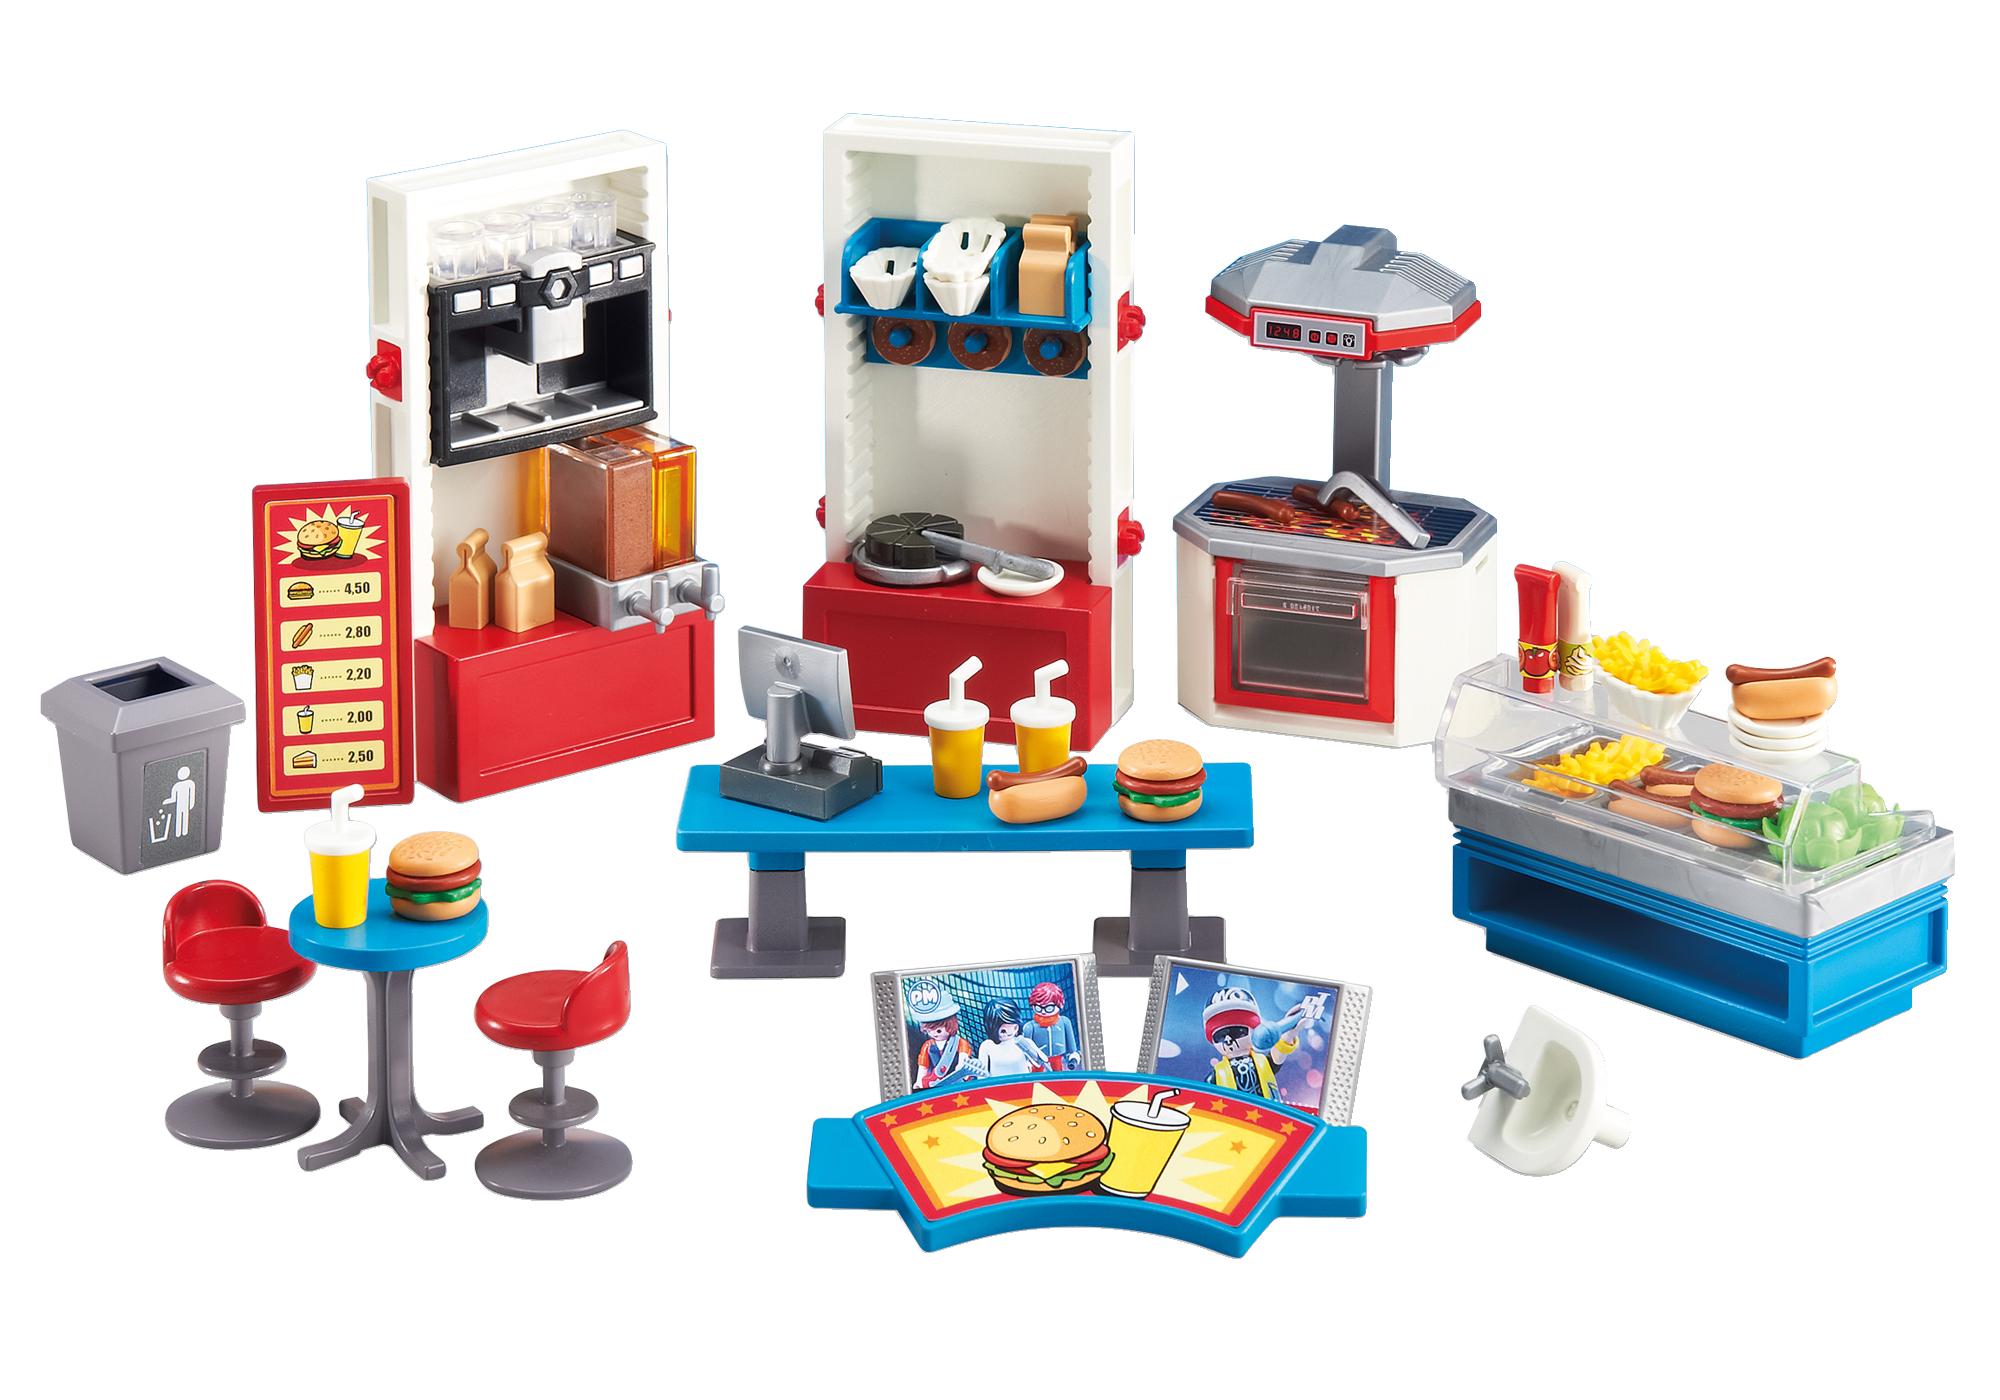 http://media.playmobil.com/i/playmobil/6441_product_detail/Schnellrestaurant